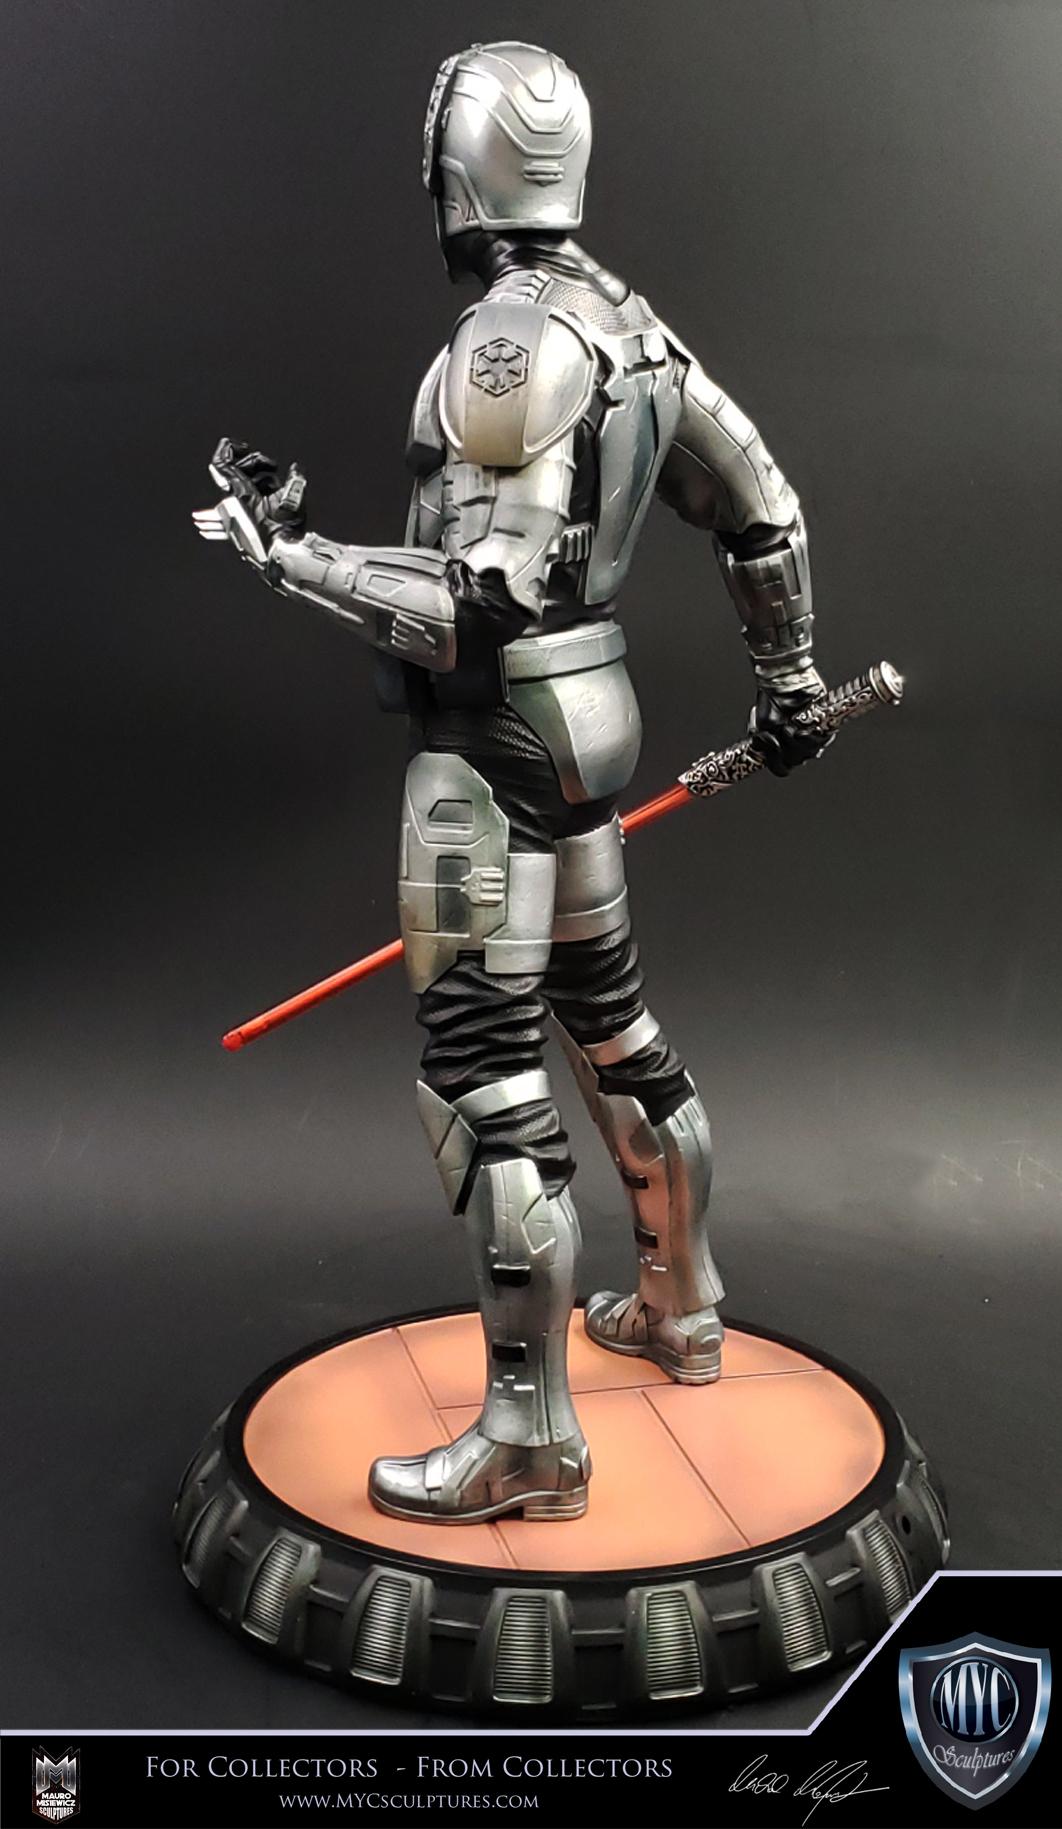 Sith_Acolyte_MYC_Sculptures_Statue_18